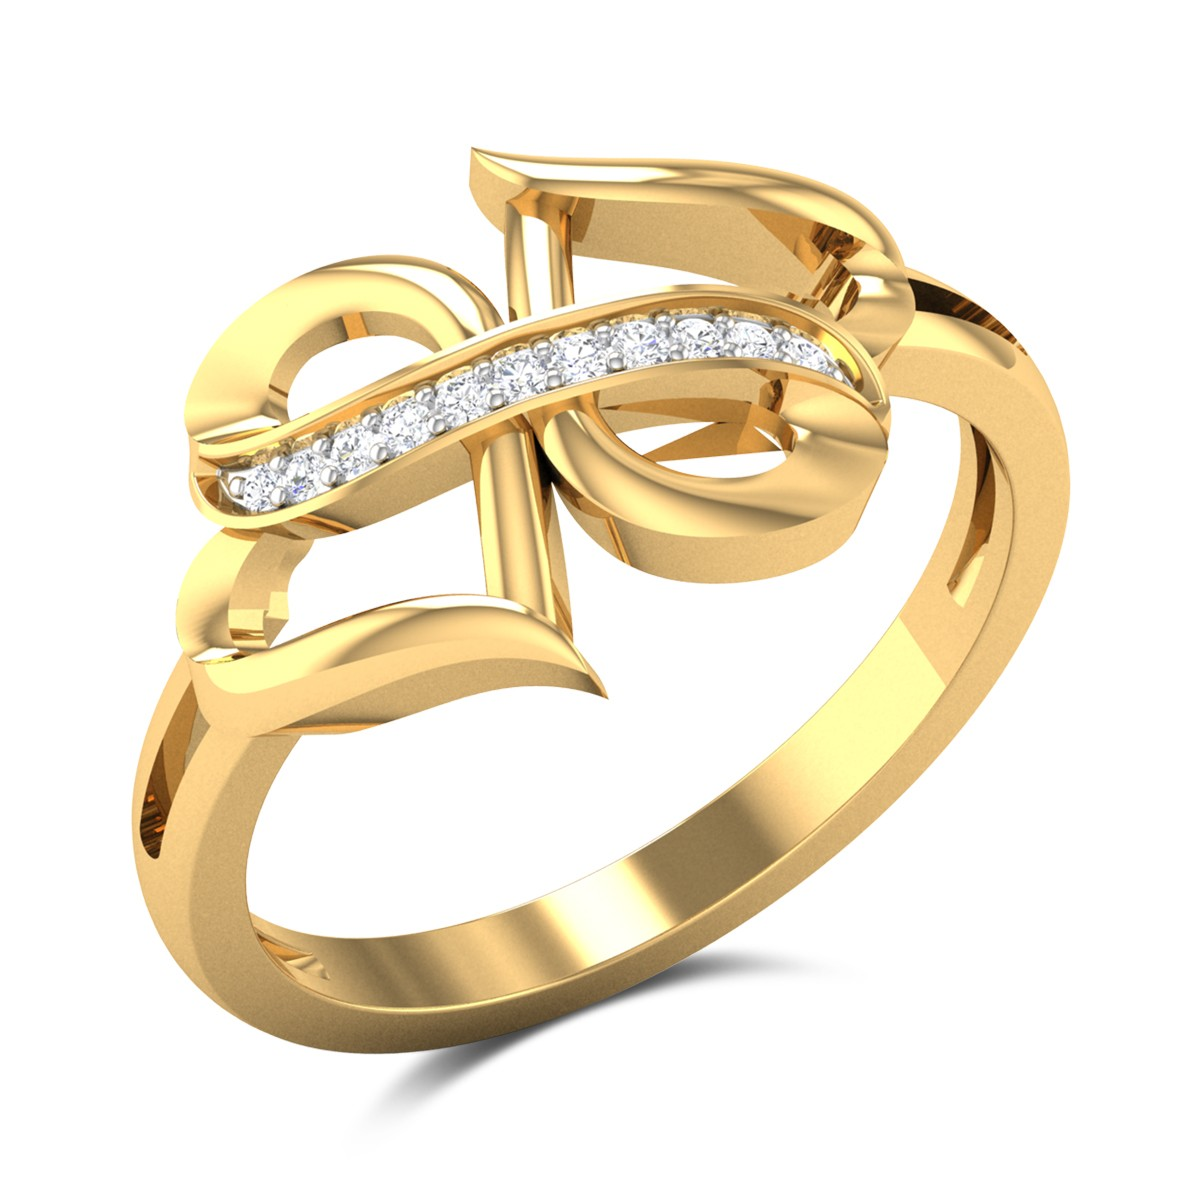 Acheflow Dual Heart Diamond Ring